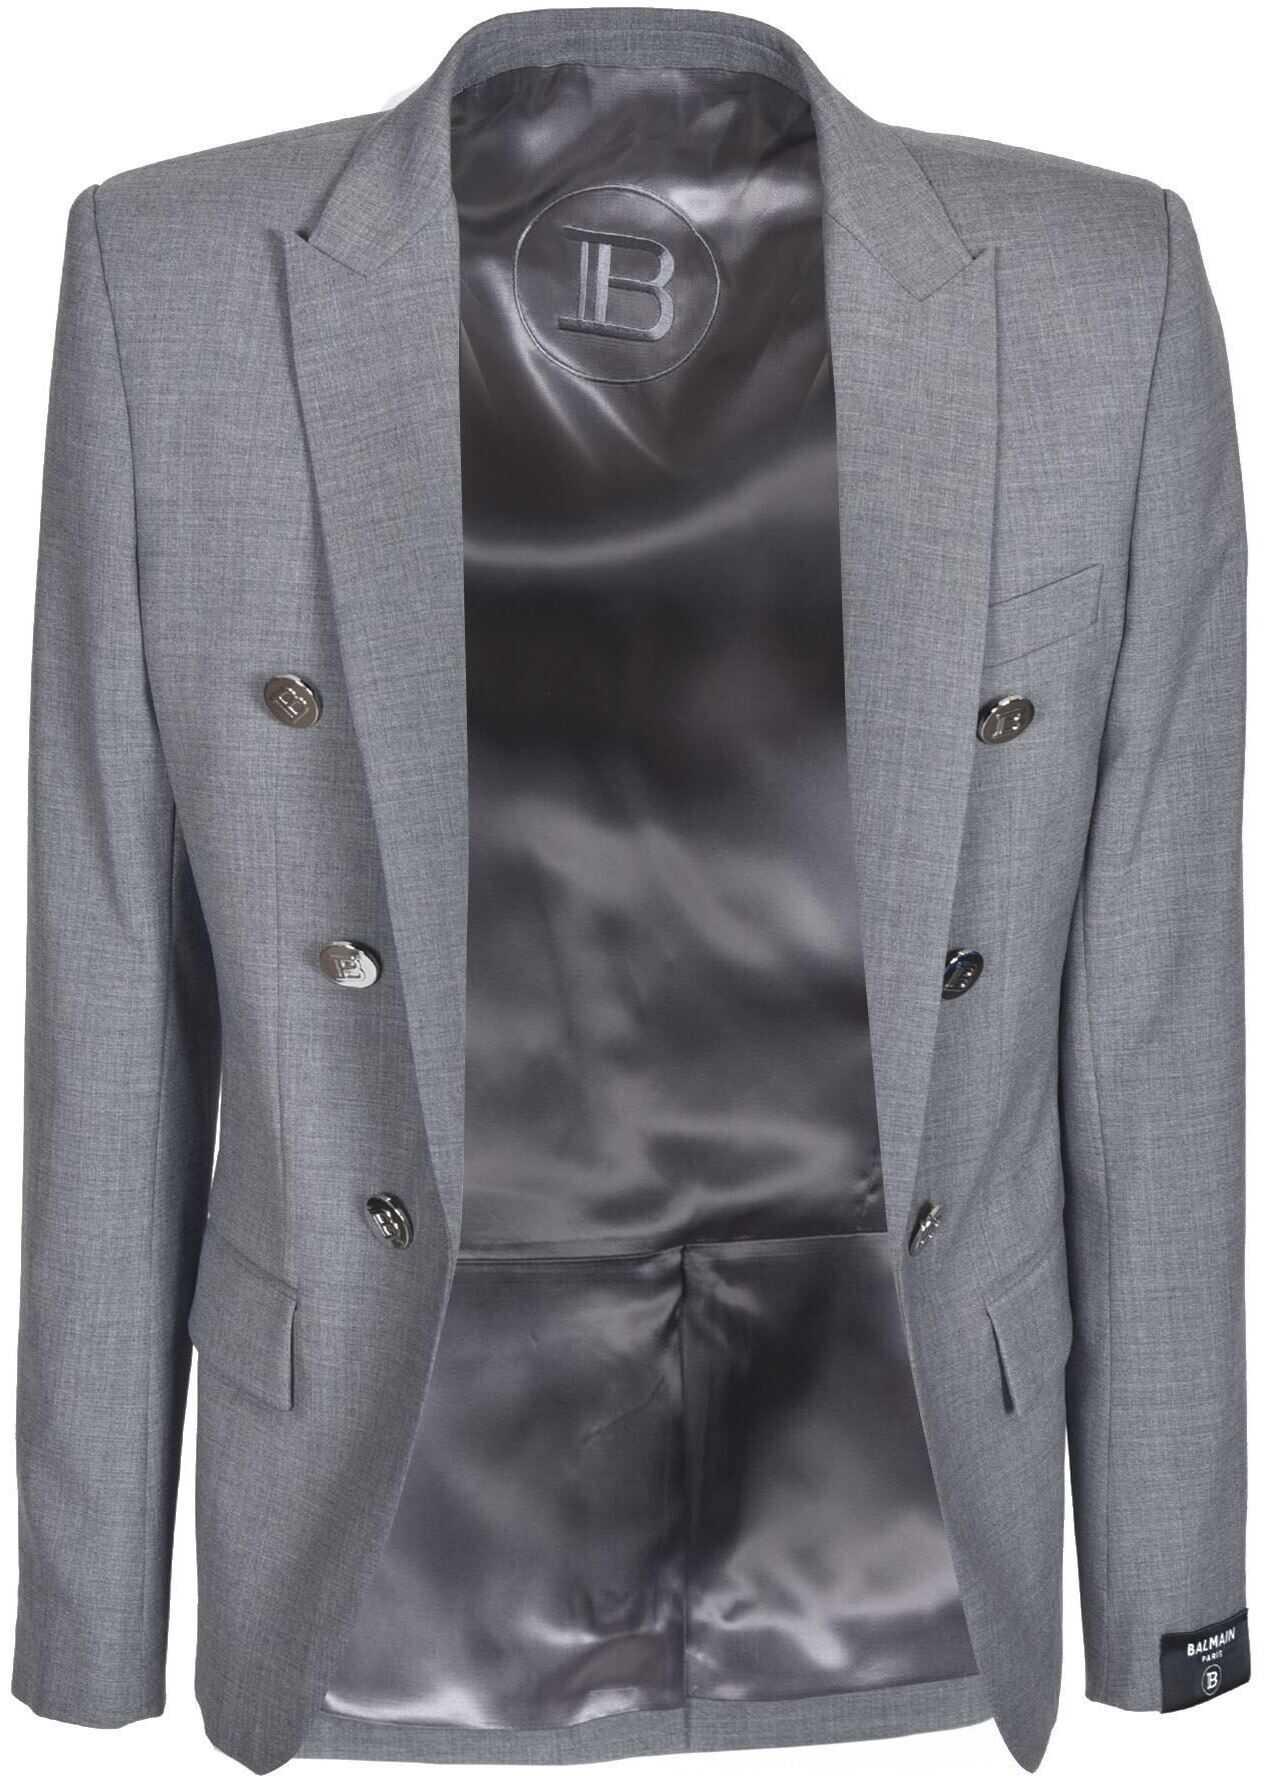 Balmain Decorative Buttons Jacket In Gray Grey imagine